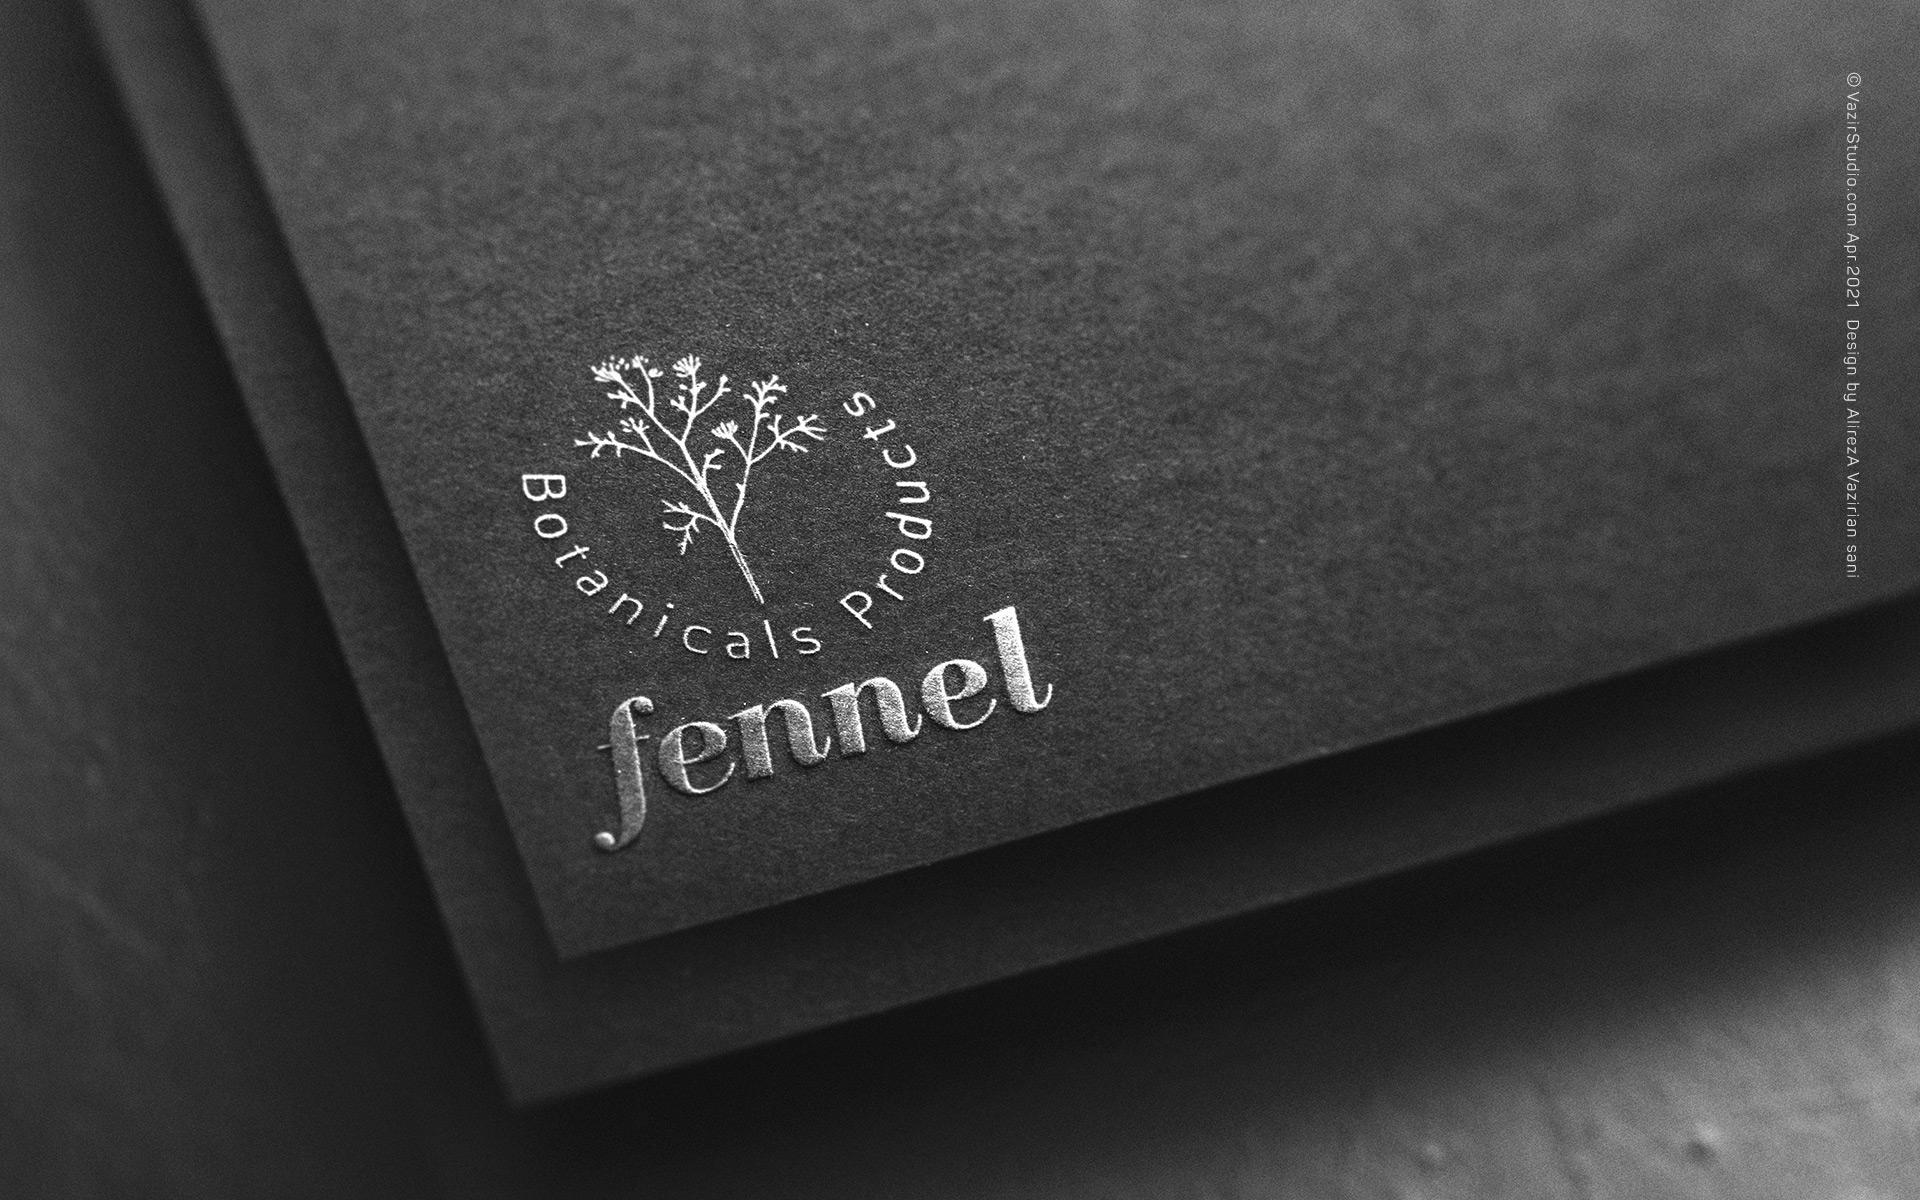 fennel botanicals products online shoping logo design by vazirstudio.com